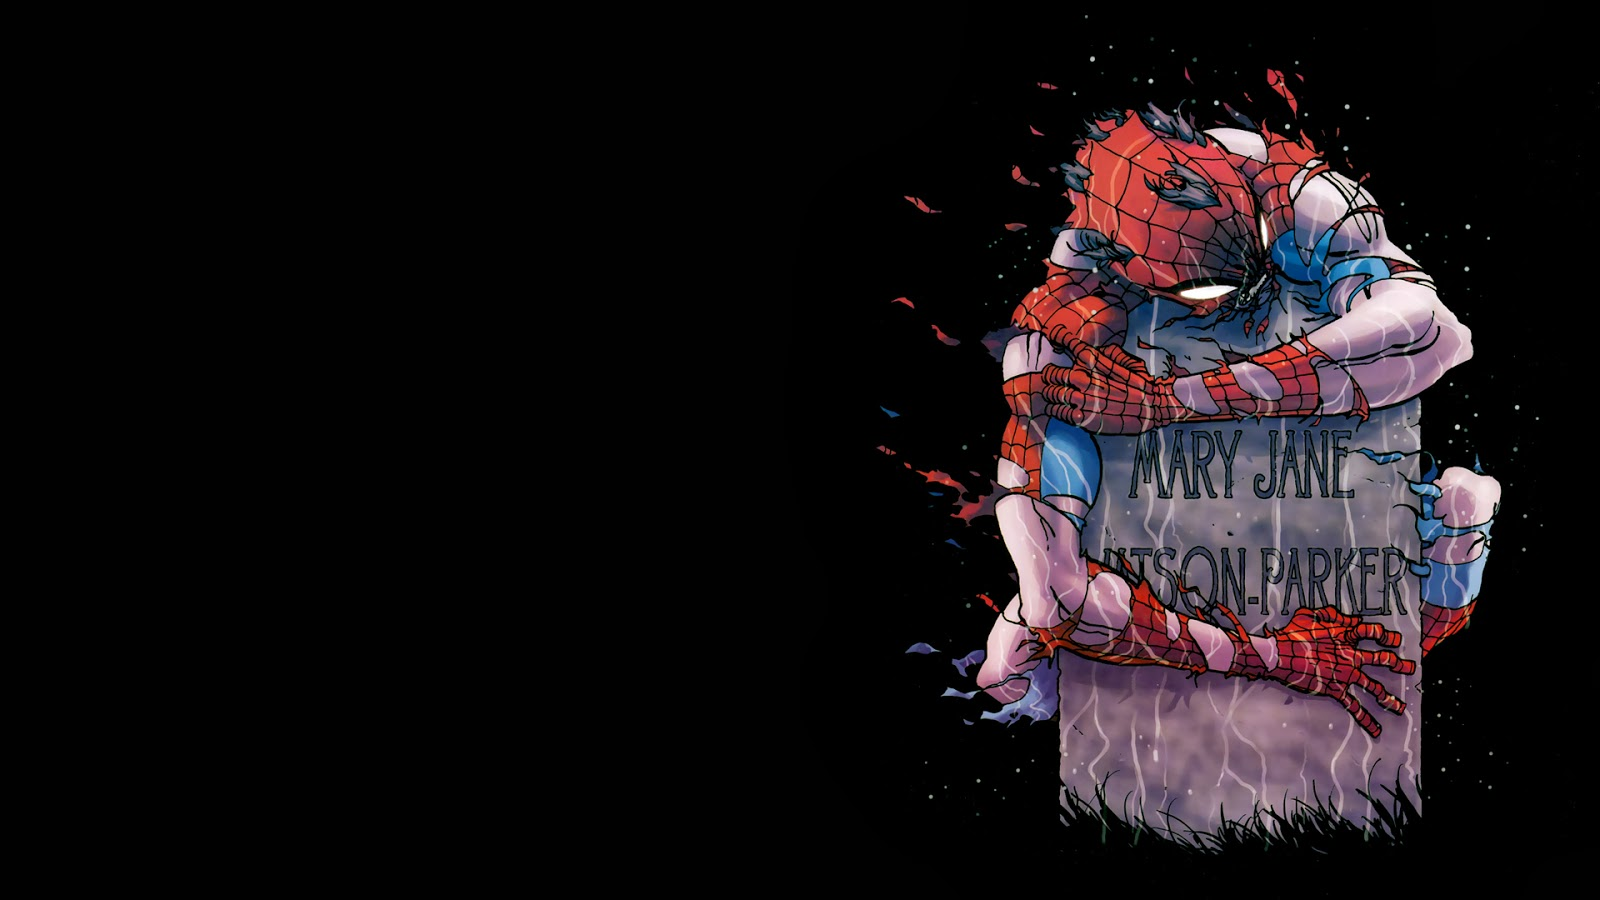 Killzone Shadow Fall Full Hd Wallpaper Wallpapers Hd Pack Wallpapers Spiderman Varias